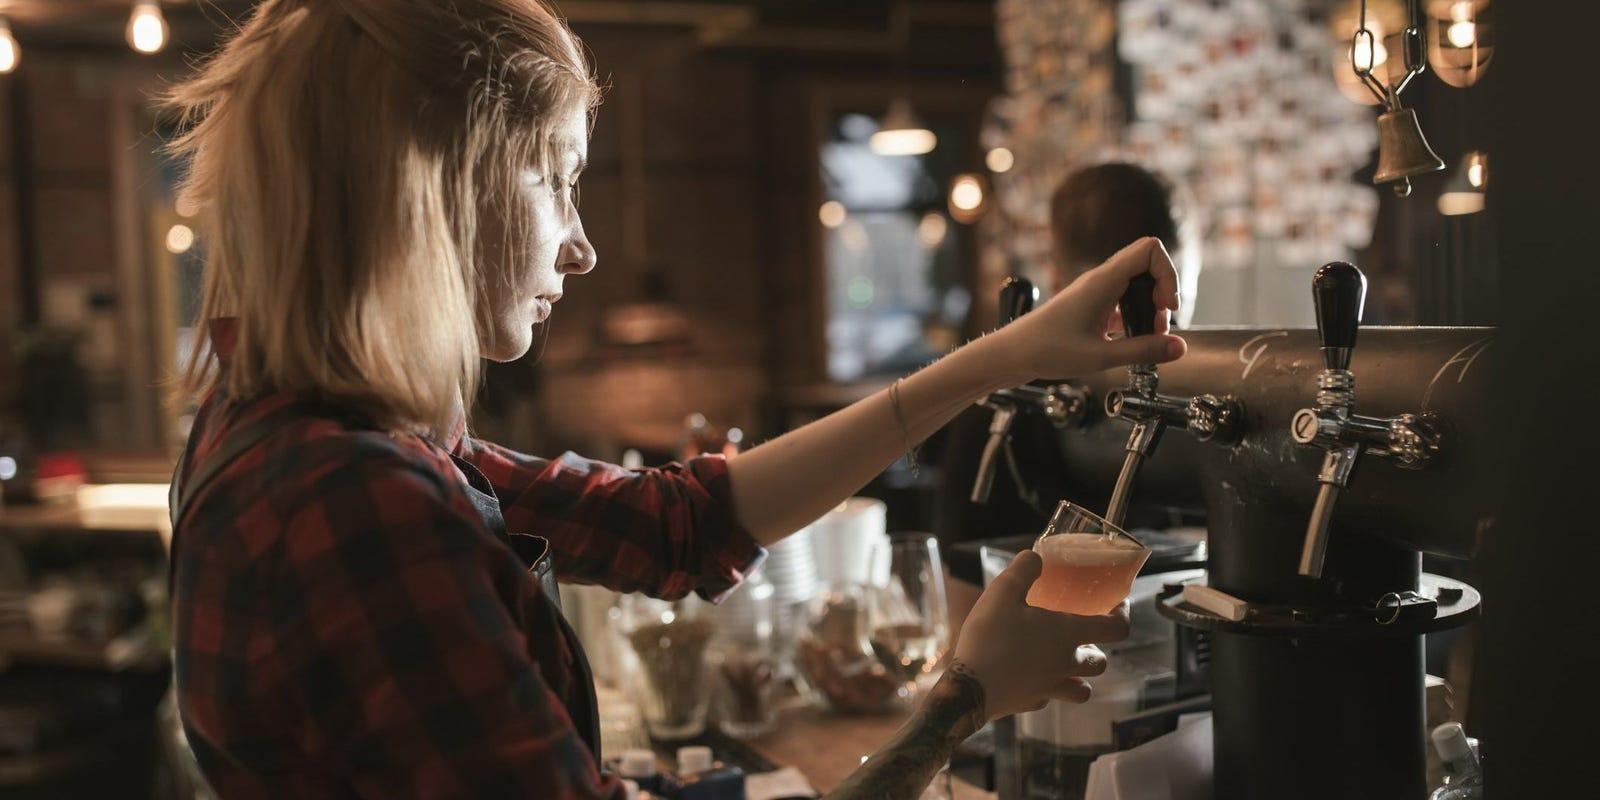 Coronavirus pandemic creates brewing crisis for craft beer industry